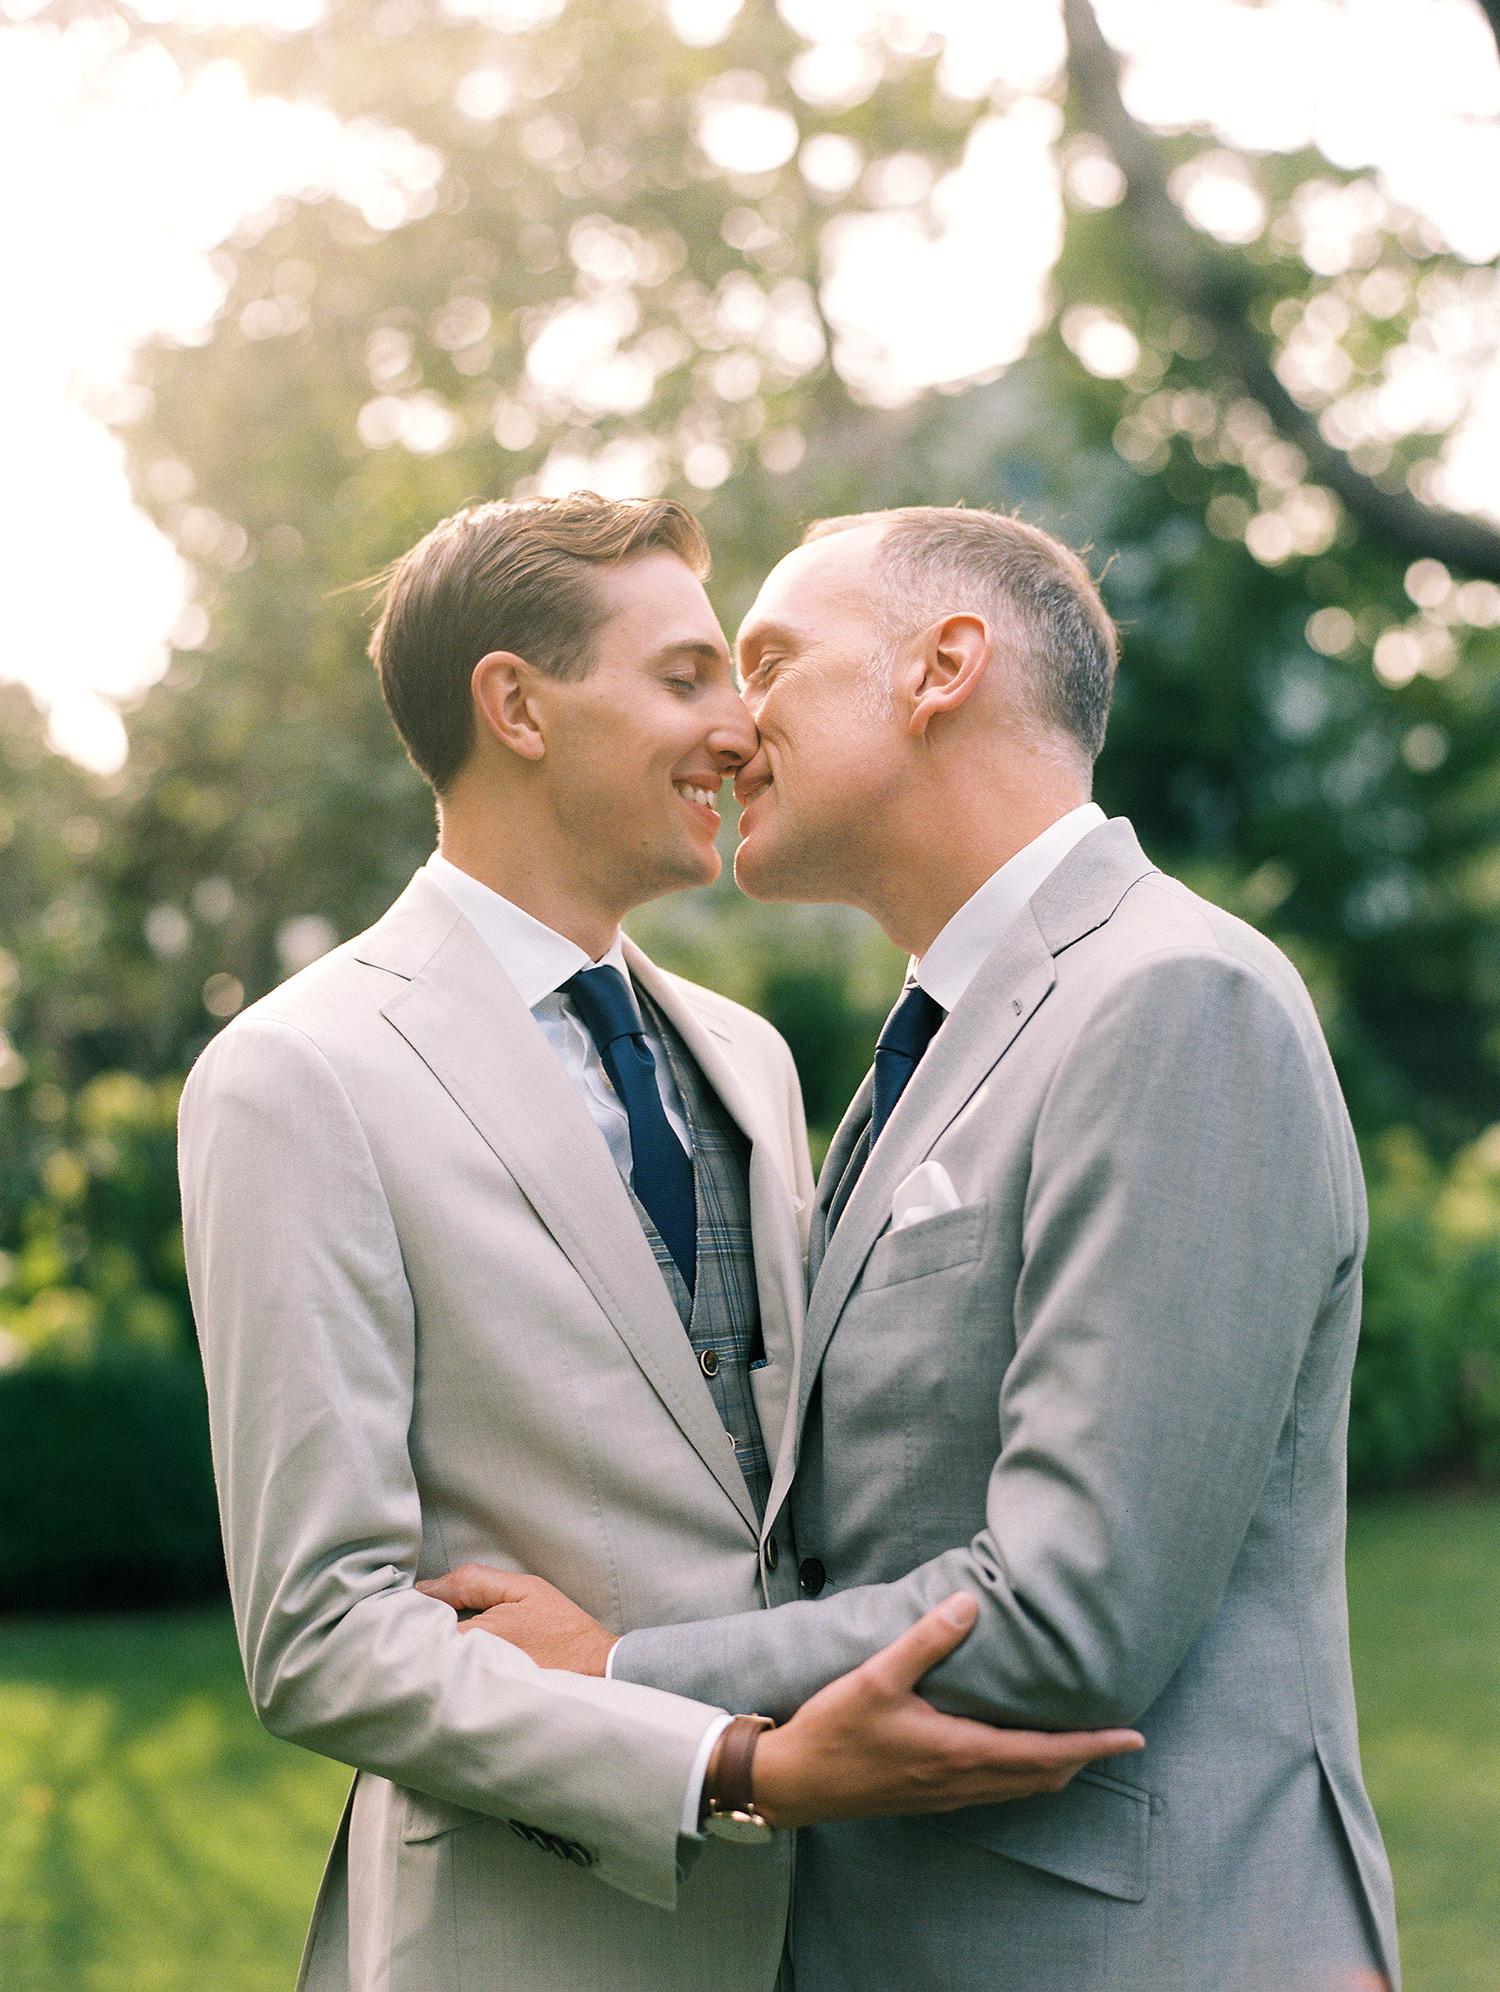 charles andrew wedding grooms outdoor kiss